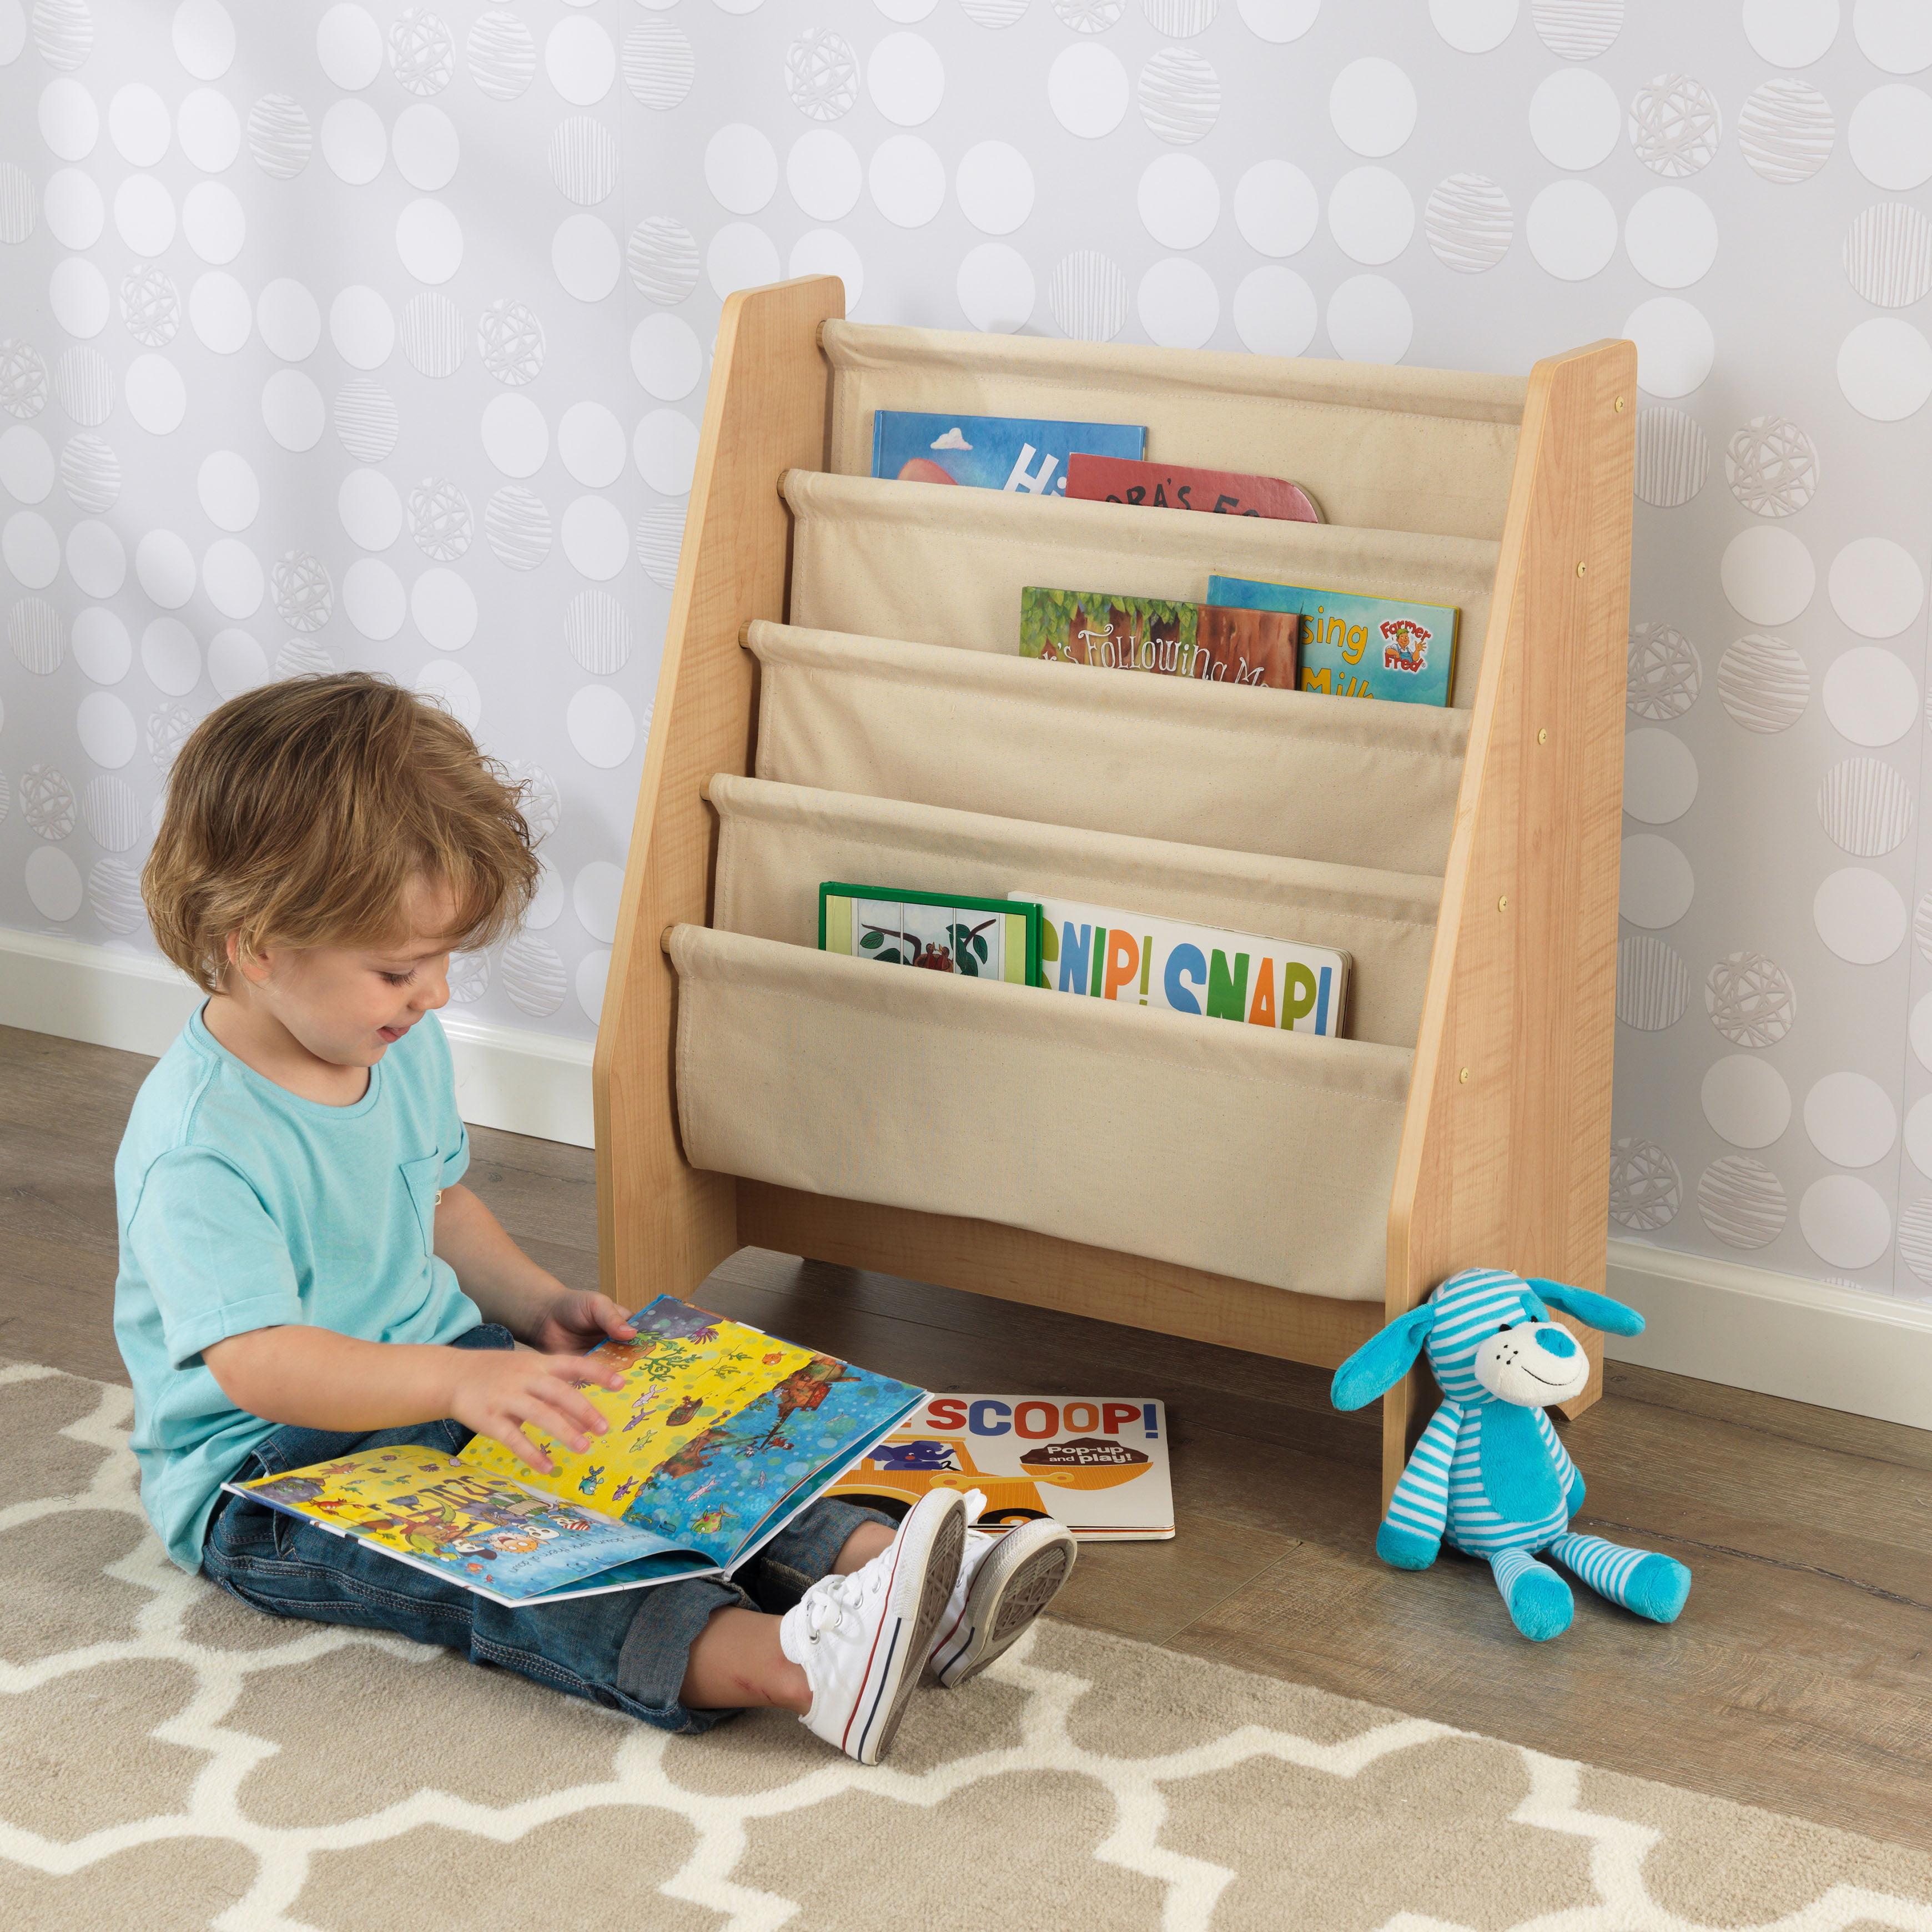 New Playroom Library Sling Bookshelf Organizer 4 Storage Pocket Natural